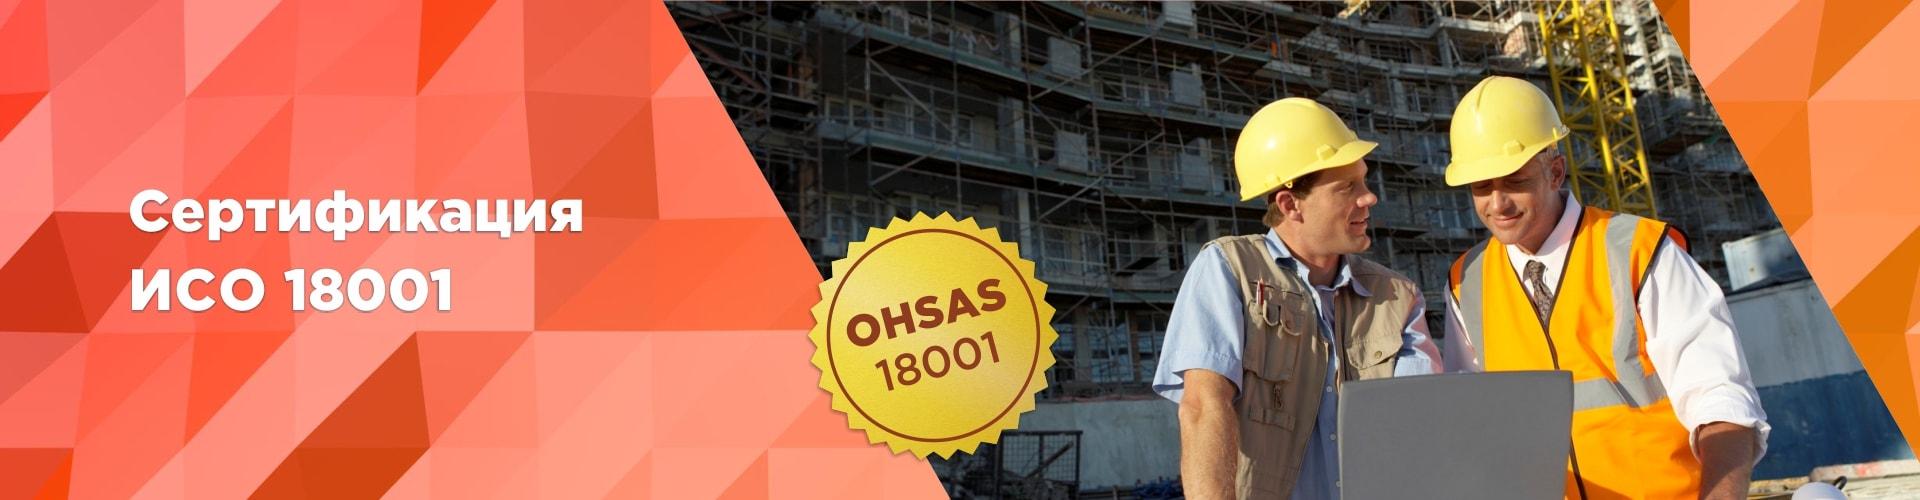 Сертификация 18001 Алматы